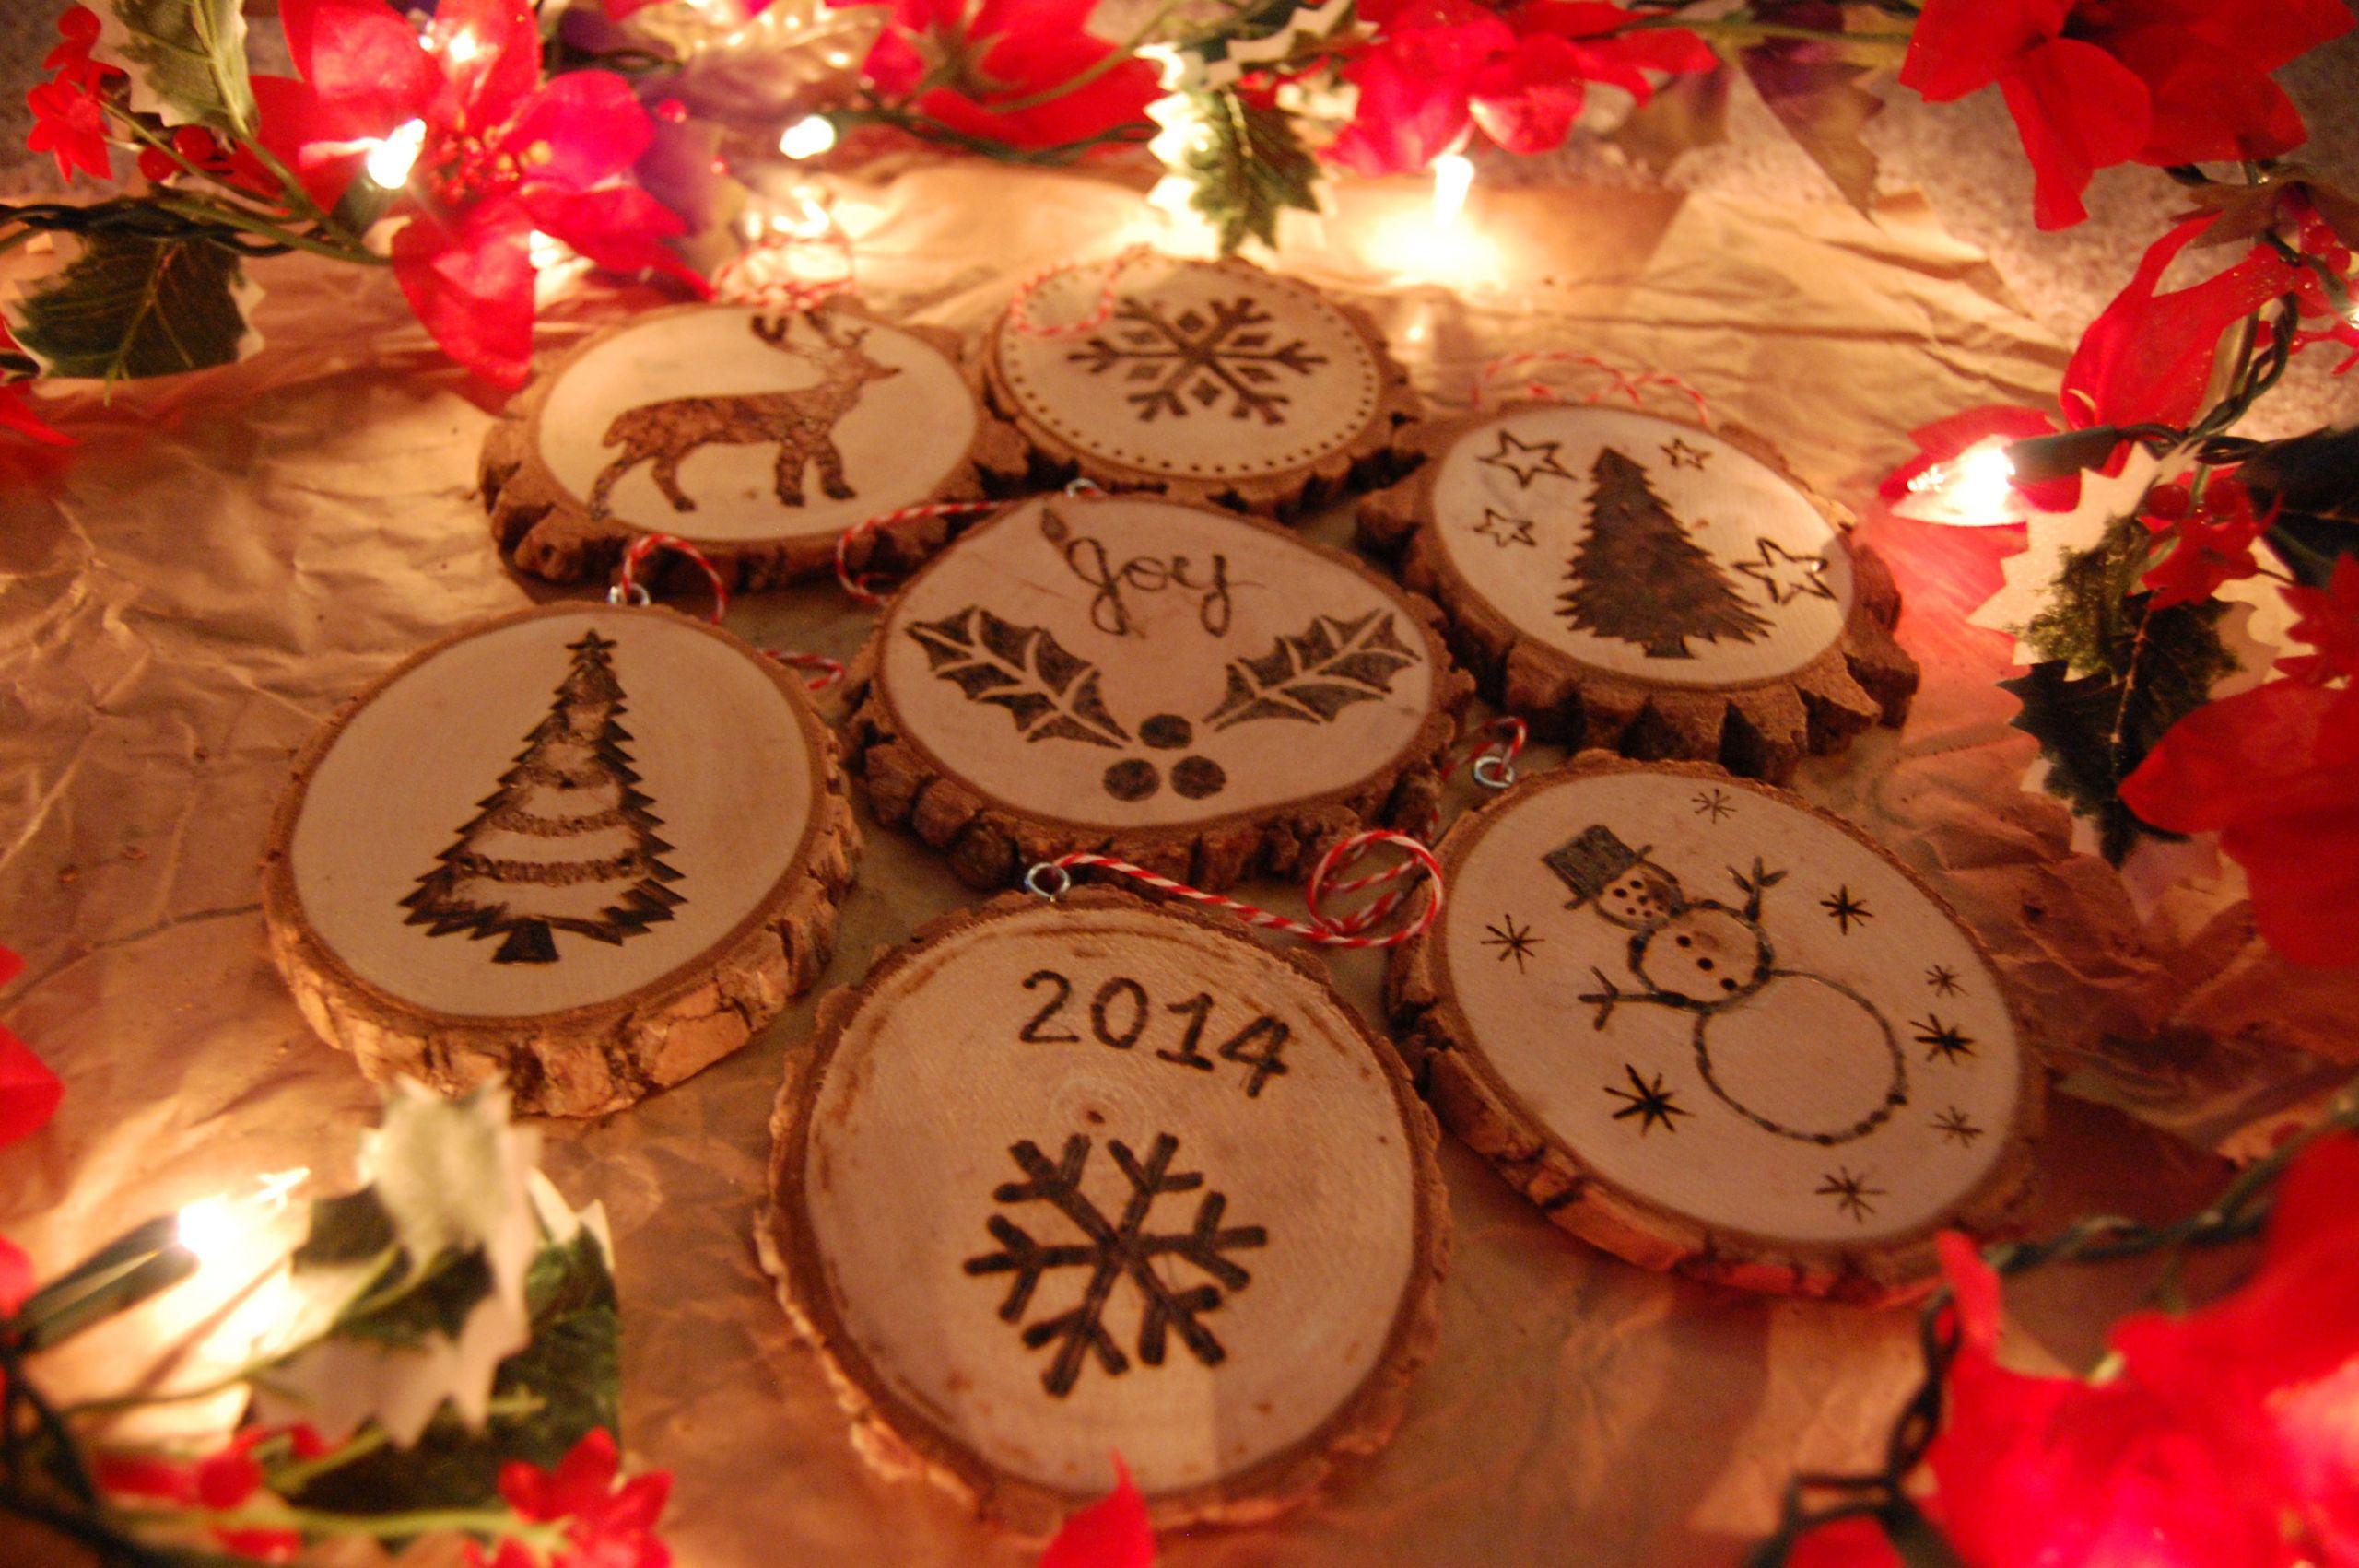 DIY Wooden Christmas Decorations  DIY Wood Christmas Ornaments